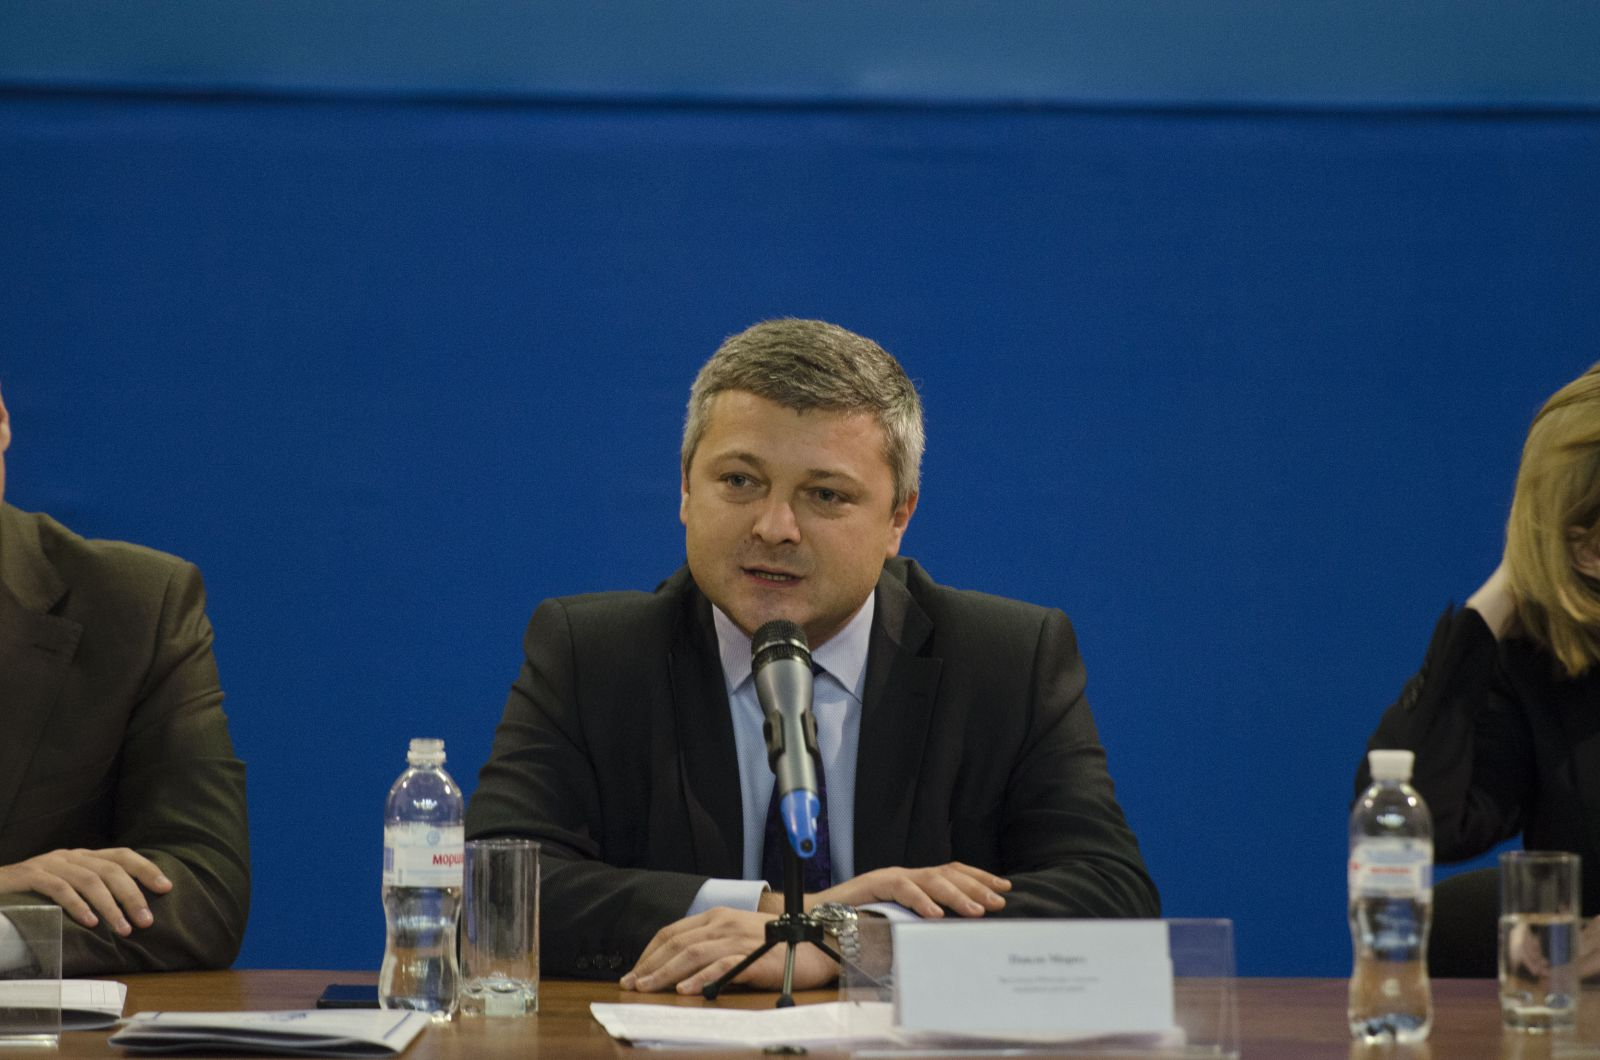 Замминистра юстиции подарил ресторан соратнику Януковича